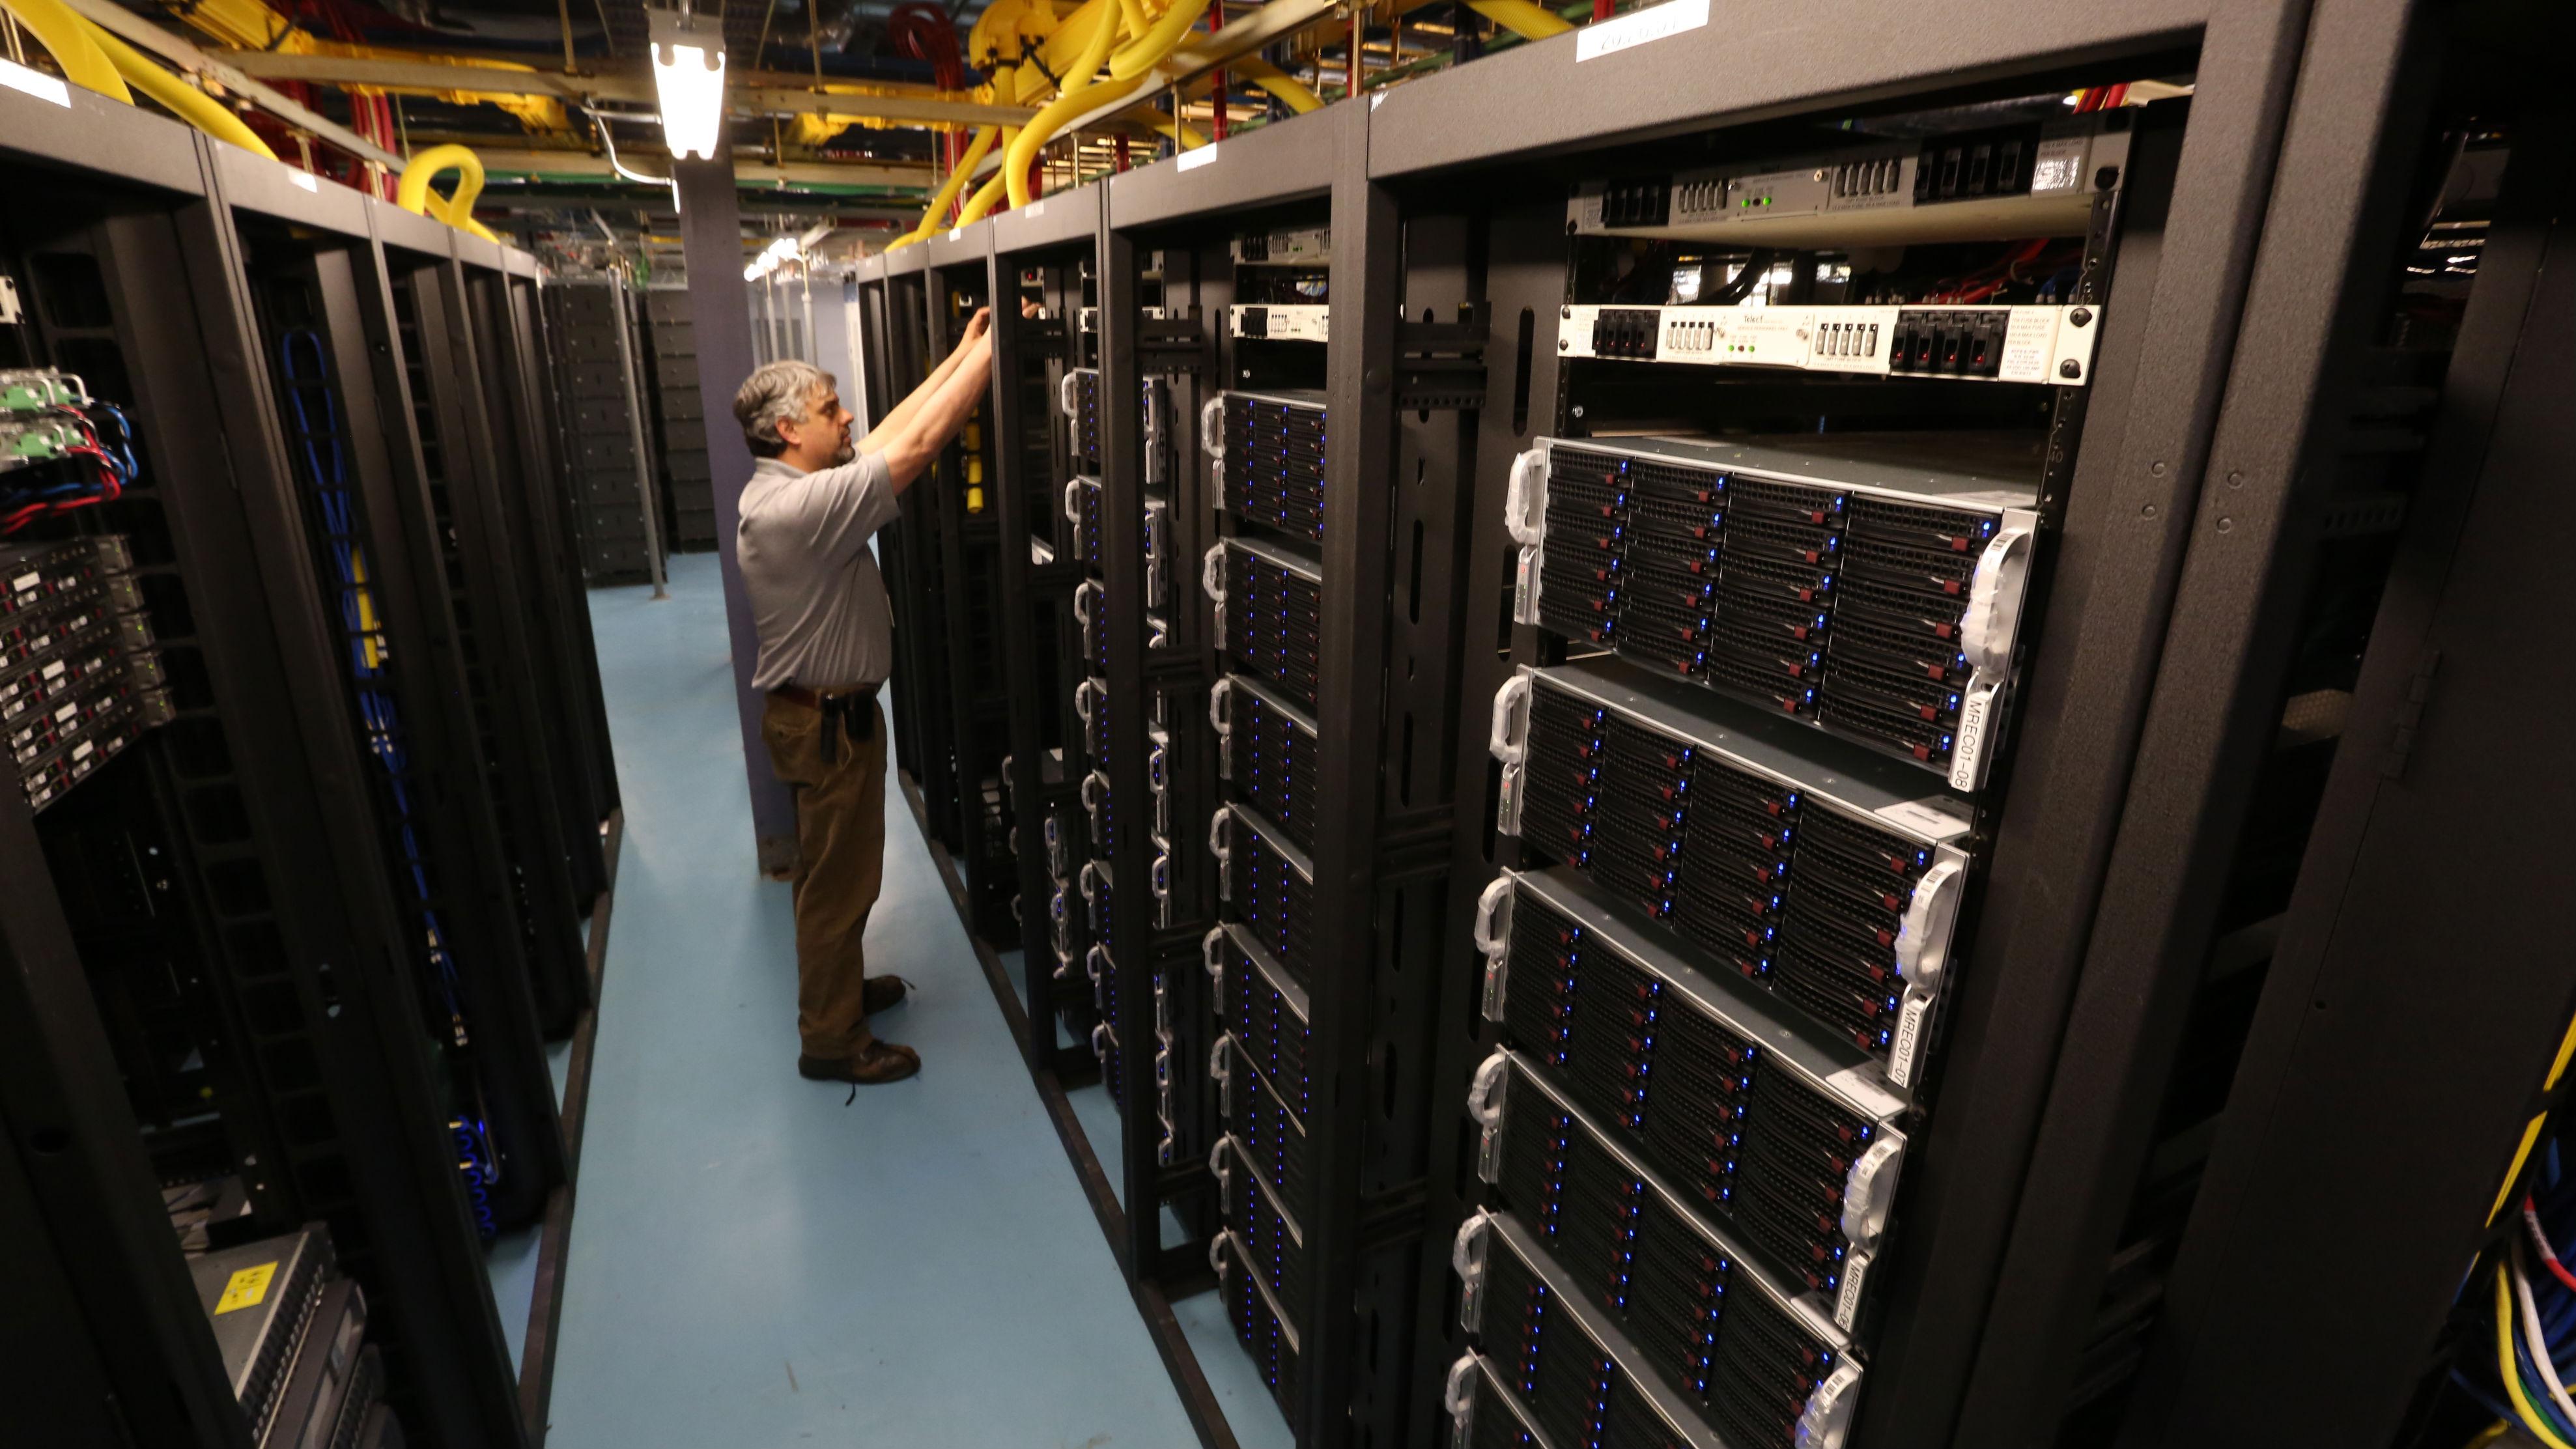 Comcast cloud DVR storage